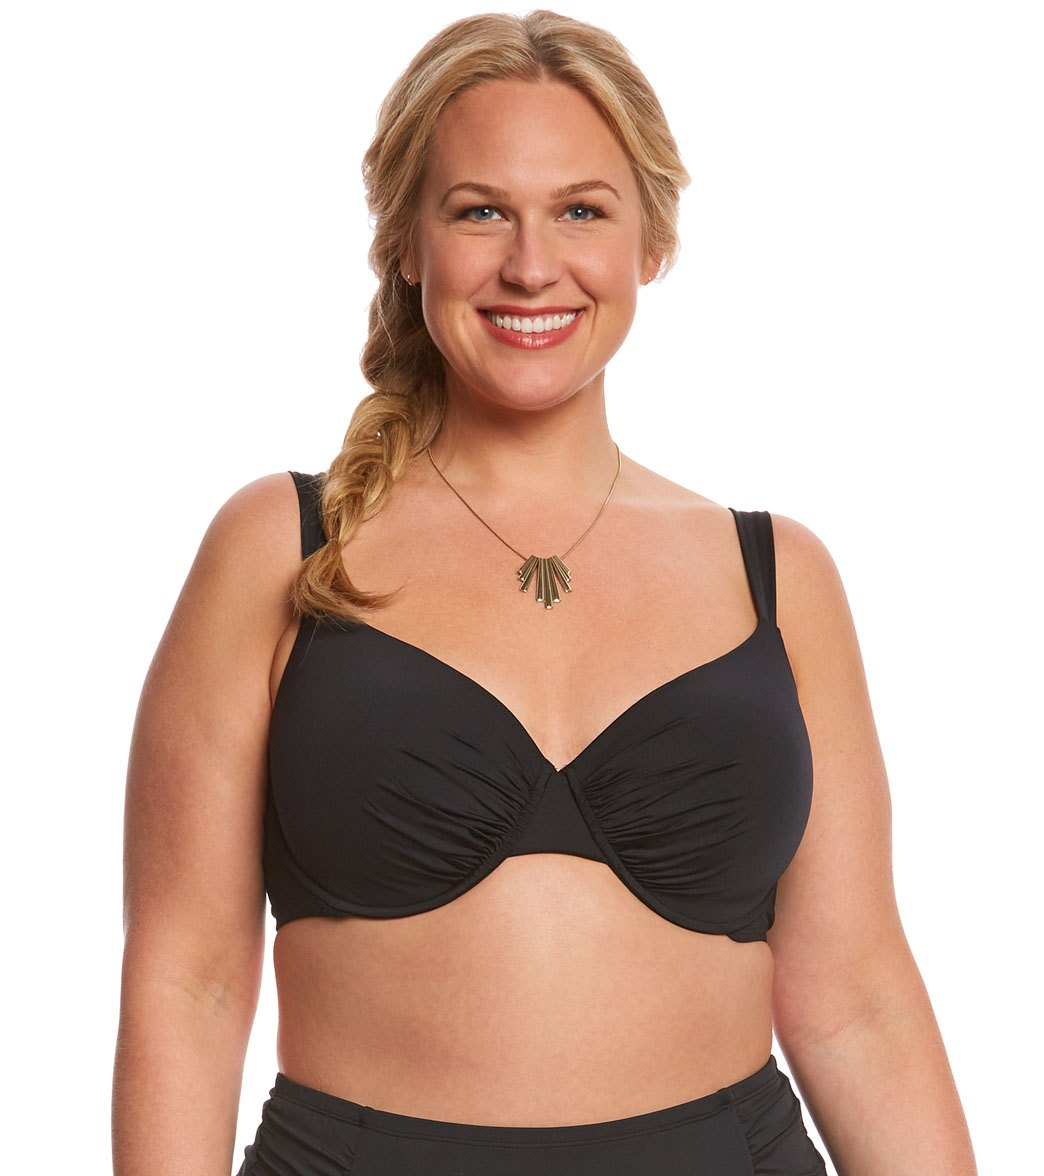 868f2617b83 ... Jantzen Plus Size Solid Underwire Bikini Top. MODEL MEASUREMENTS